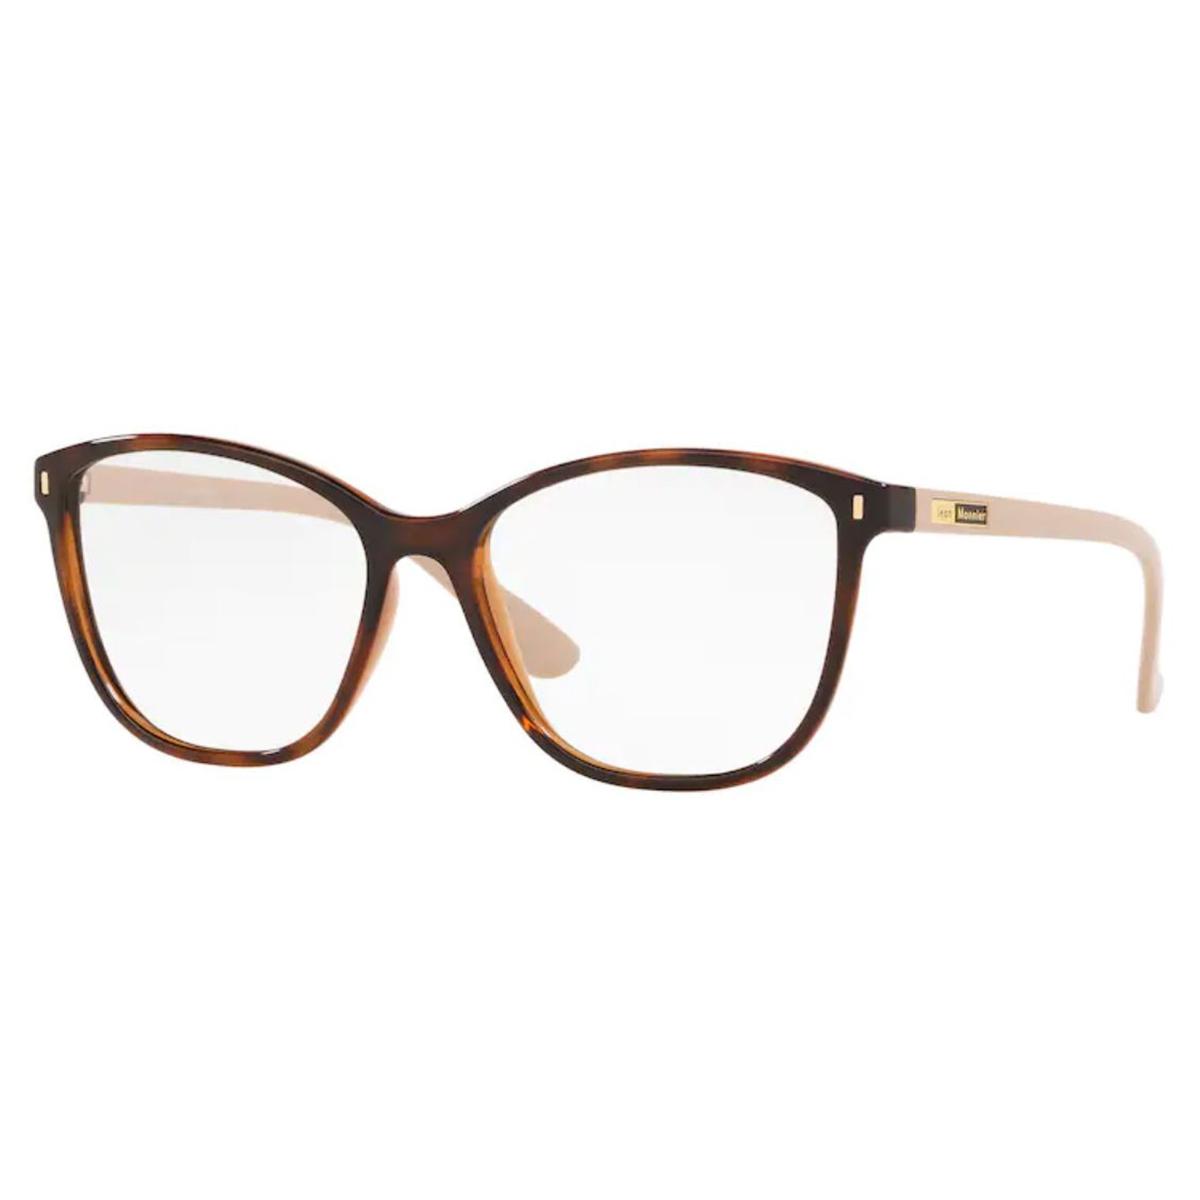 Óculos de Grau Jean Monnier J83201 Marrom Havana e Nude